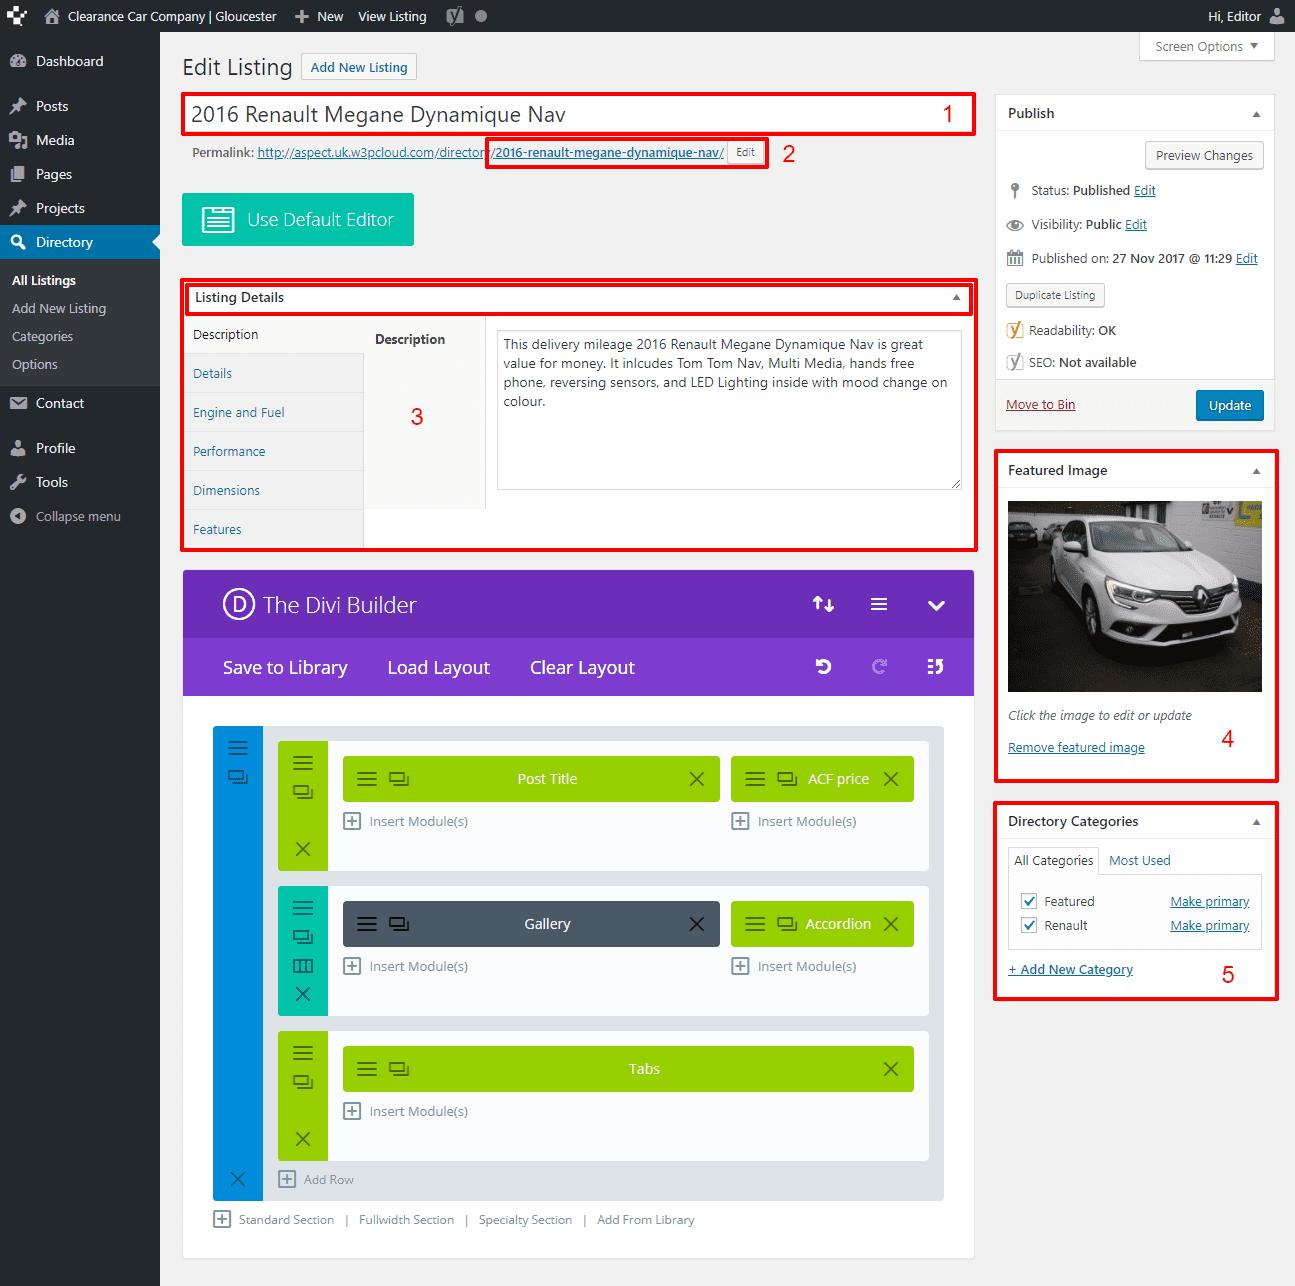 Nettl Directory - Modify a Listing